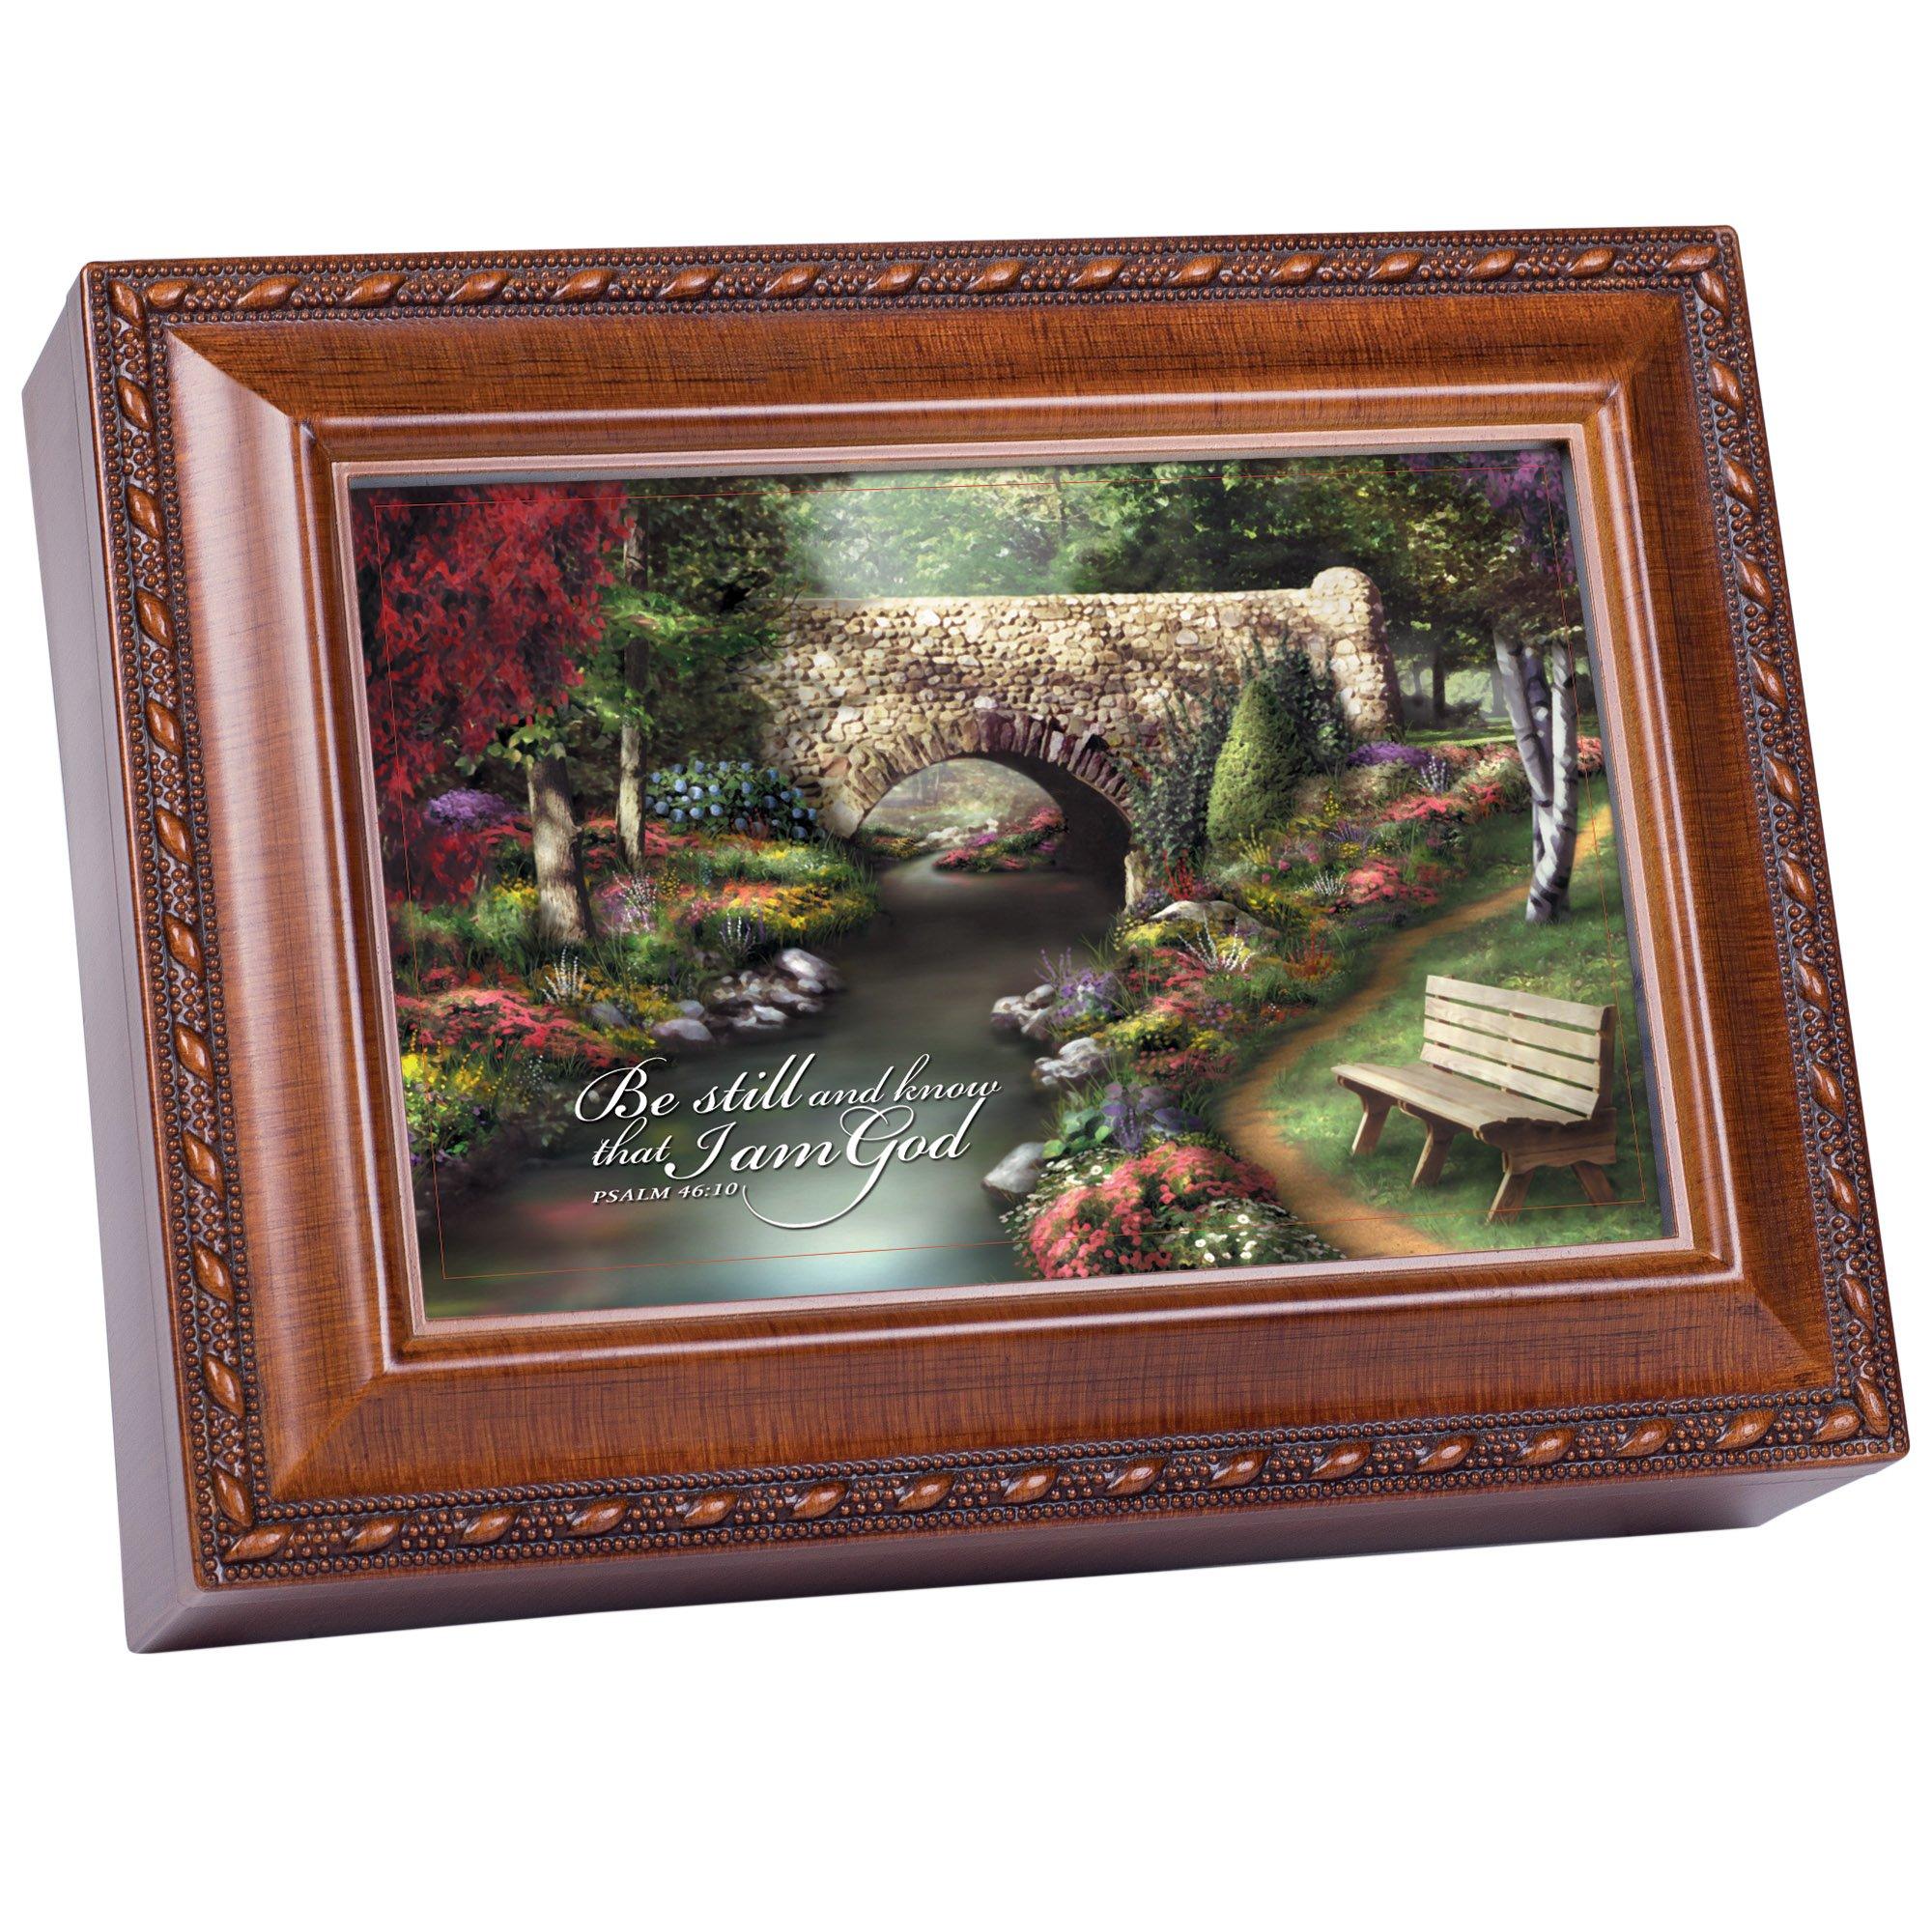 Cottage Garden Be Still Inspirational Woodgrain Traditional Music Box Plays Amazing Grace